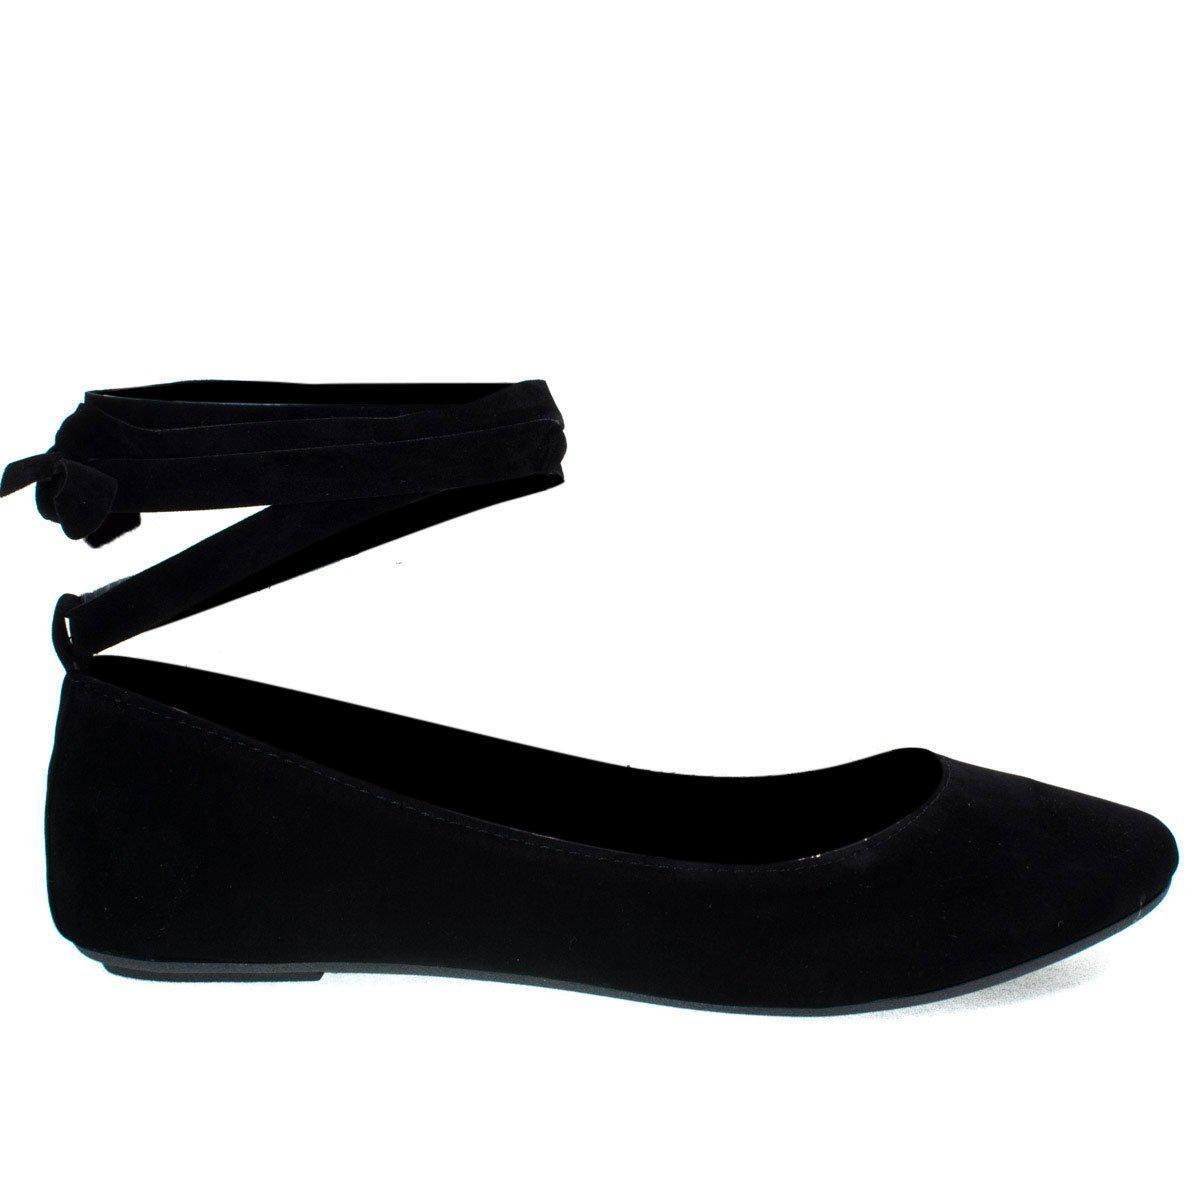 Chantel41S Black Ballet Ballerina Round Toe Flats w Leg Wrap Laces. Women Shoes -7.5